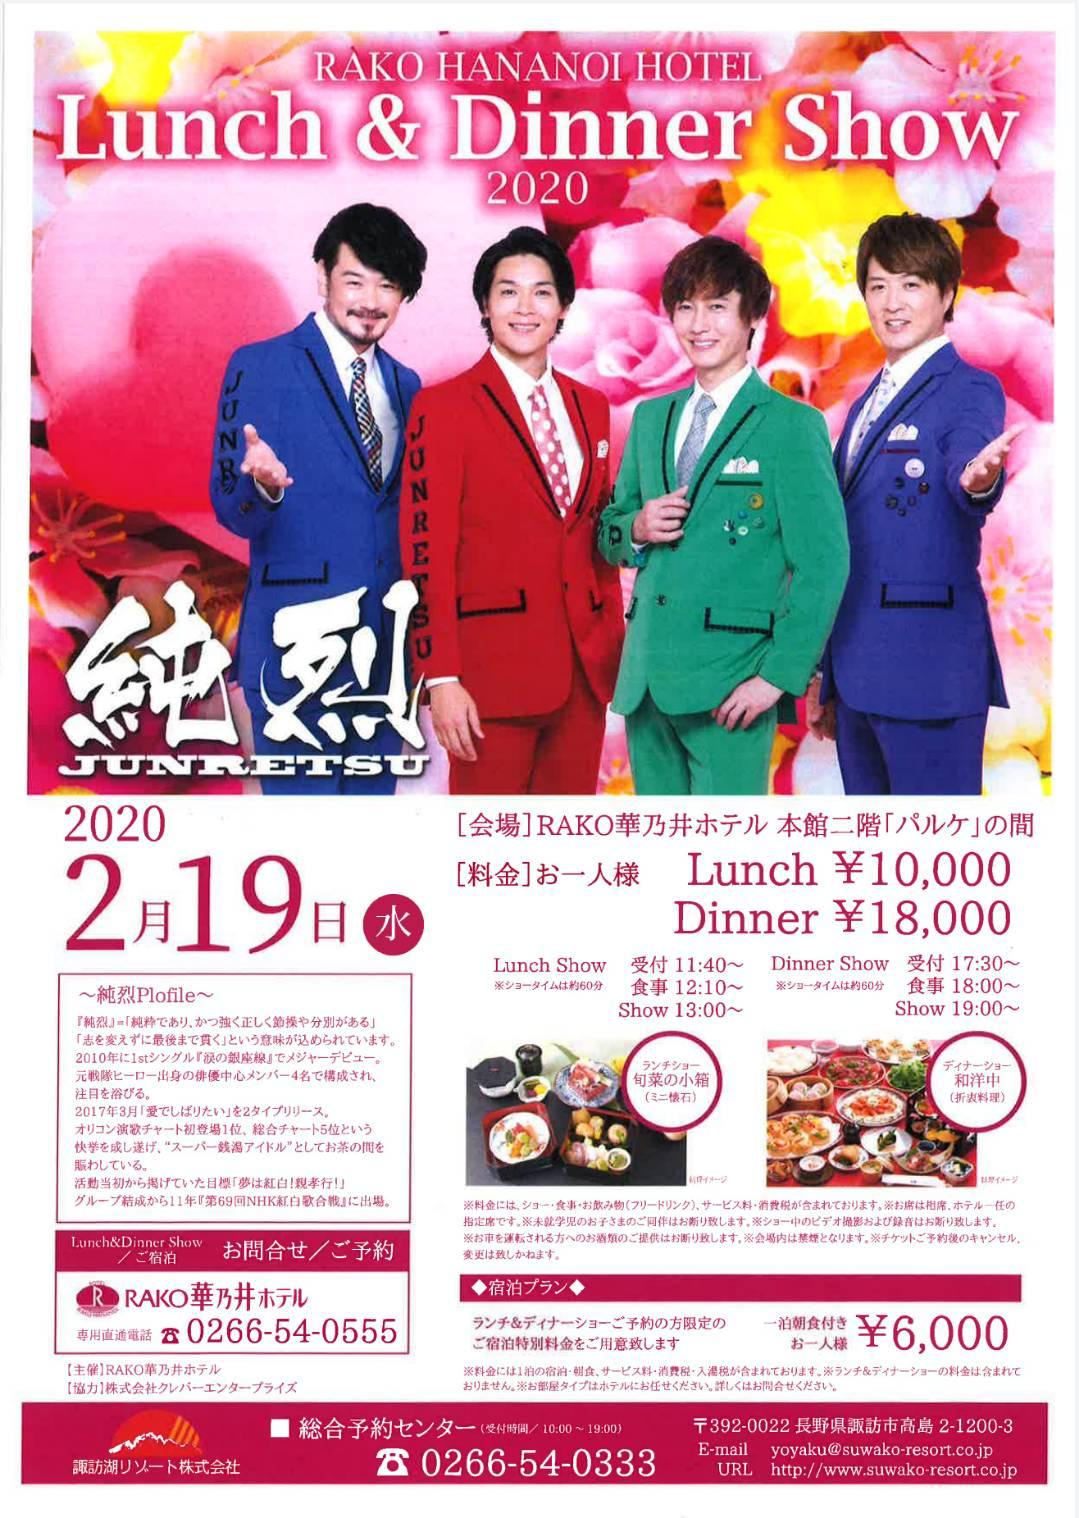 2/19 RAKO華乃井ホテル ランチ&ディナーショー2020の記事より